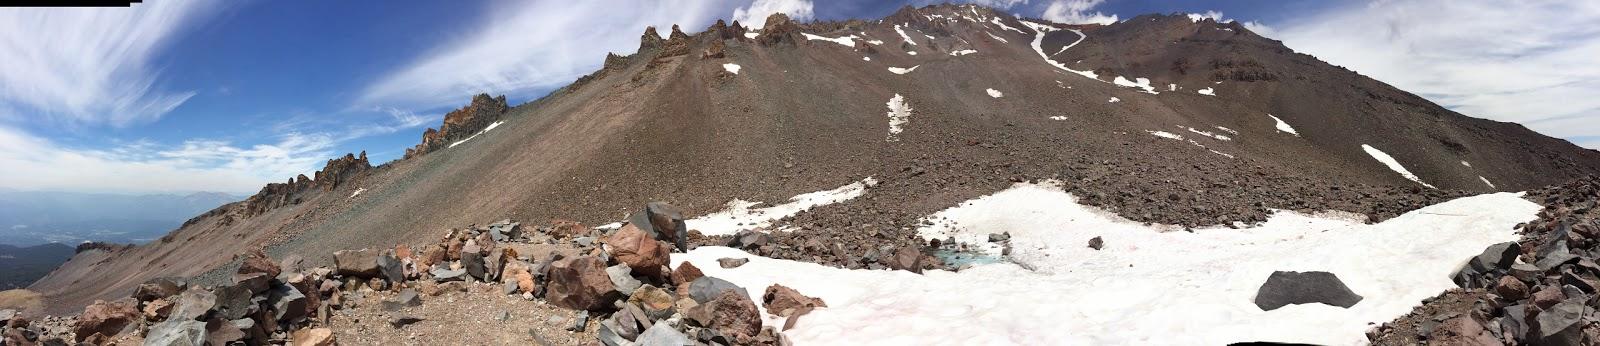 Mount Shasta by Adrenoverse